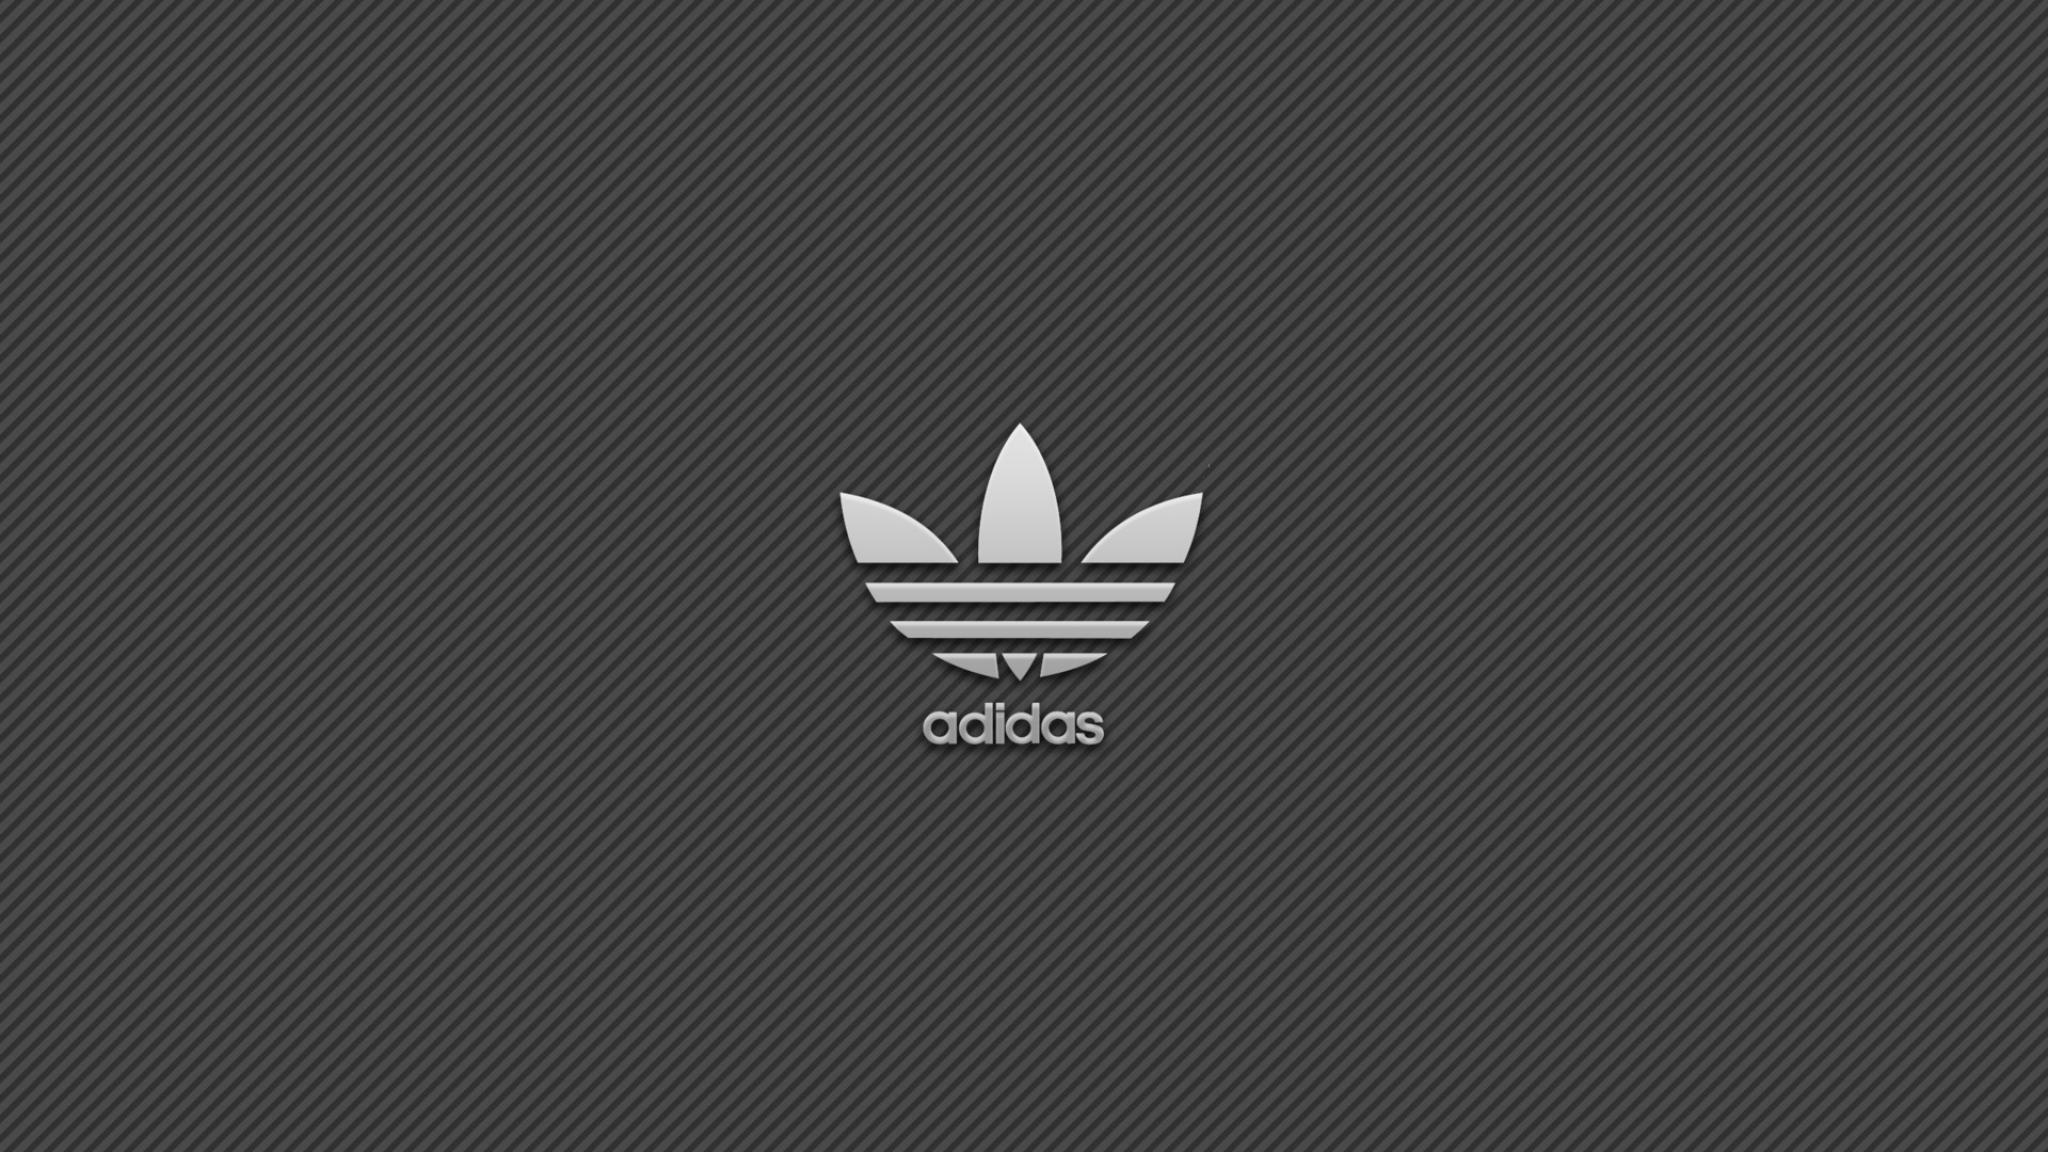 Download Wallpaper 2048x1152 Adidas Brand Logo HD HD 2048x1152